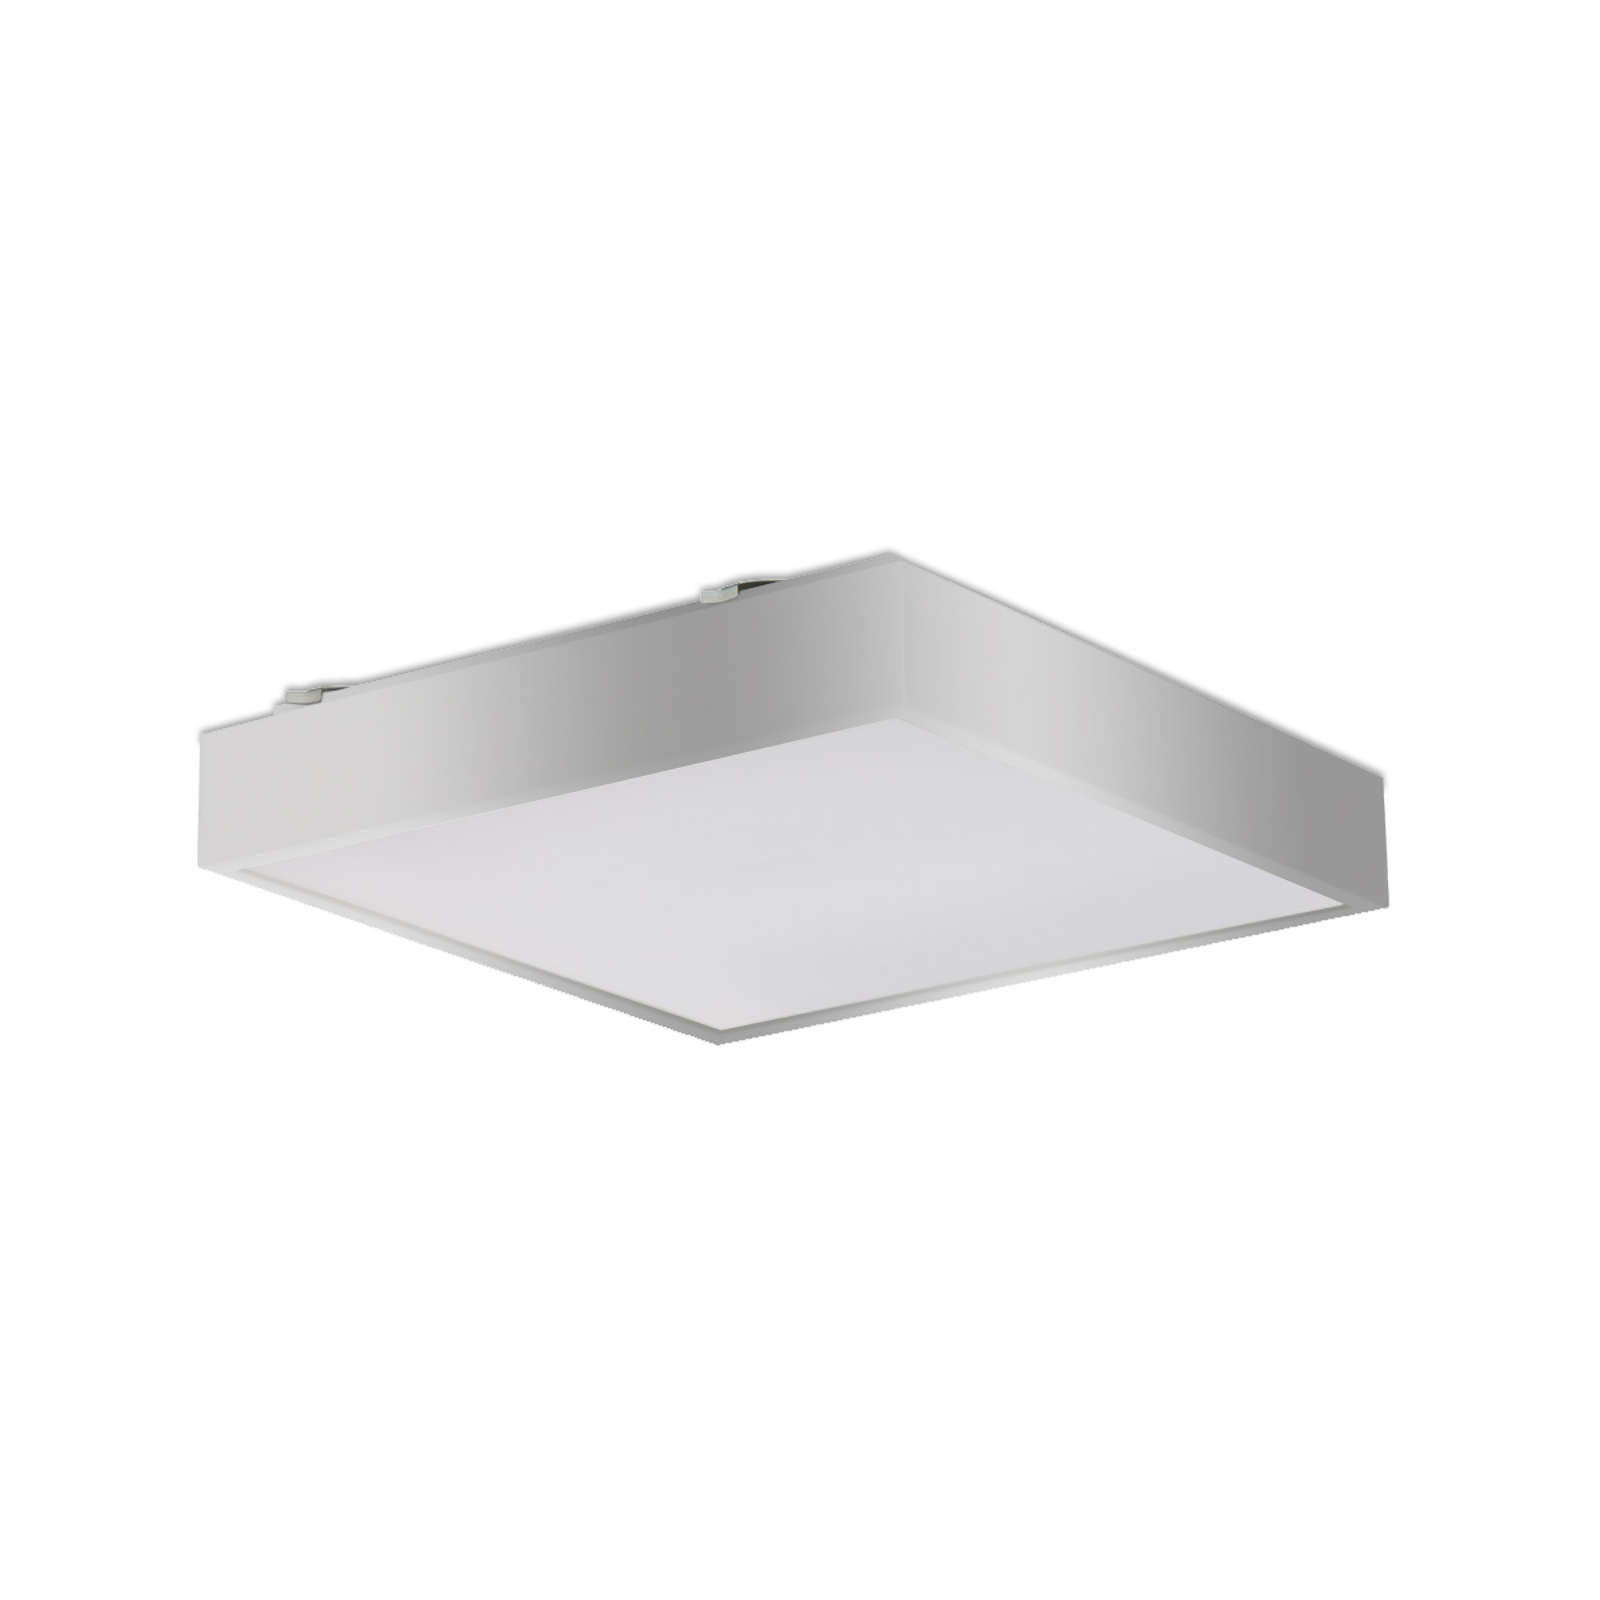 Lampa sufitowa LED Q4 srebrna DALI